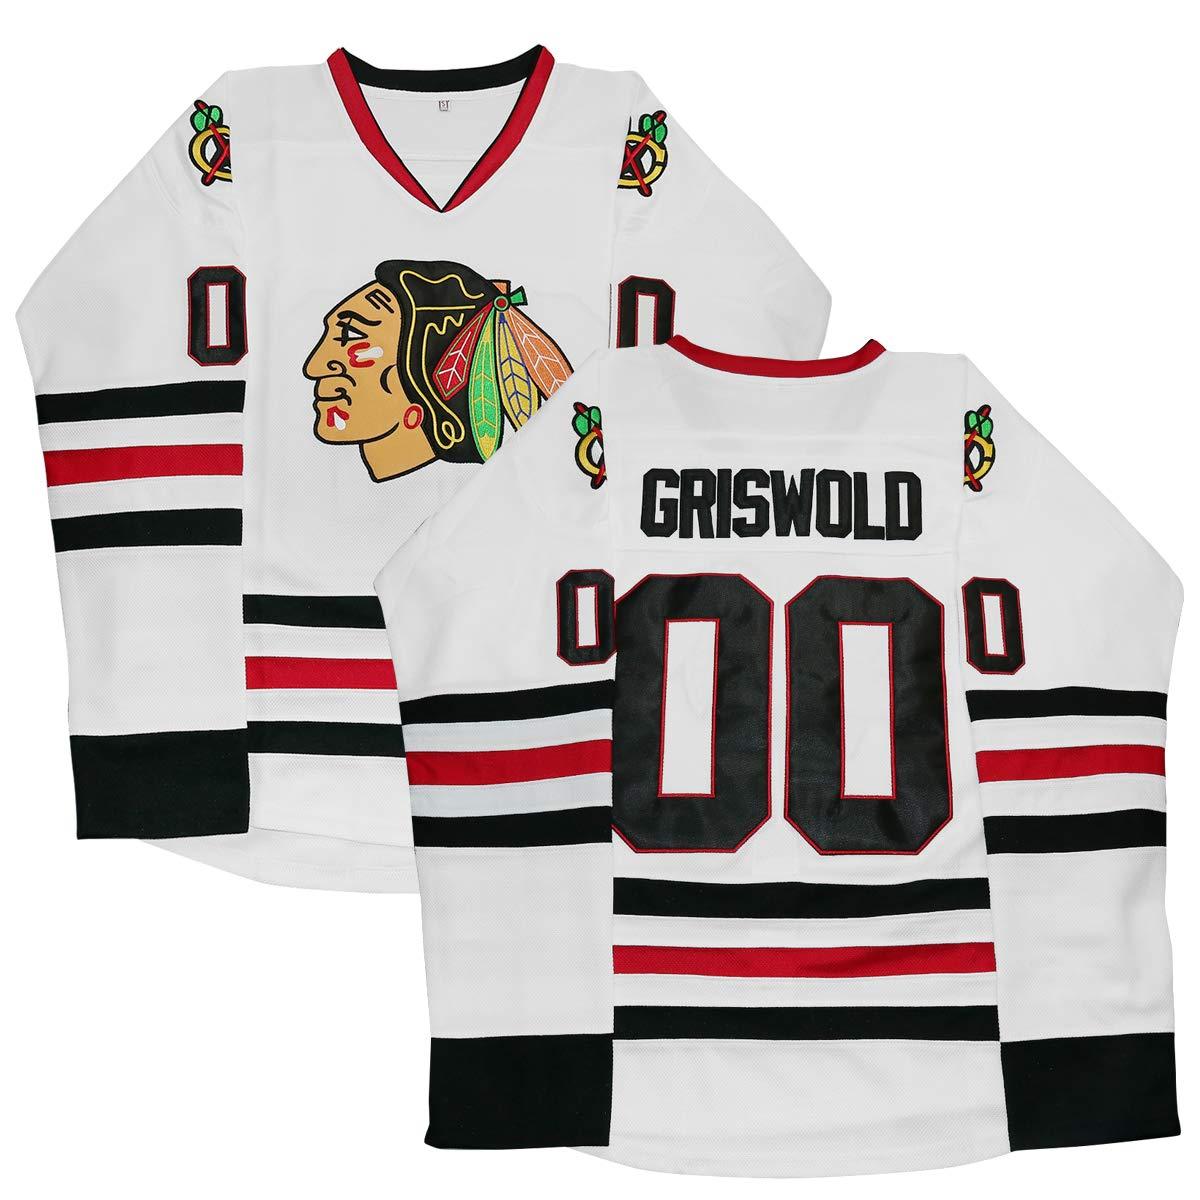 buy online 15d19 358b4 Clark Griswold Jersey,#00 X-Mas Christmas Vacation Movie Hockey Jersey  Stitched Men Ice Hockey Jerseys